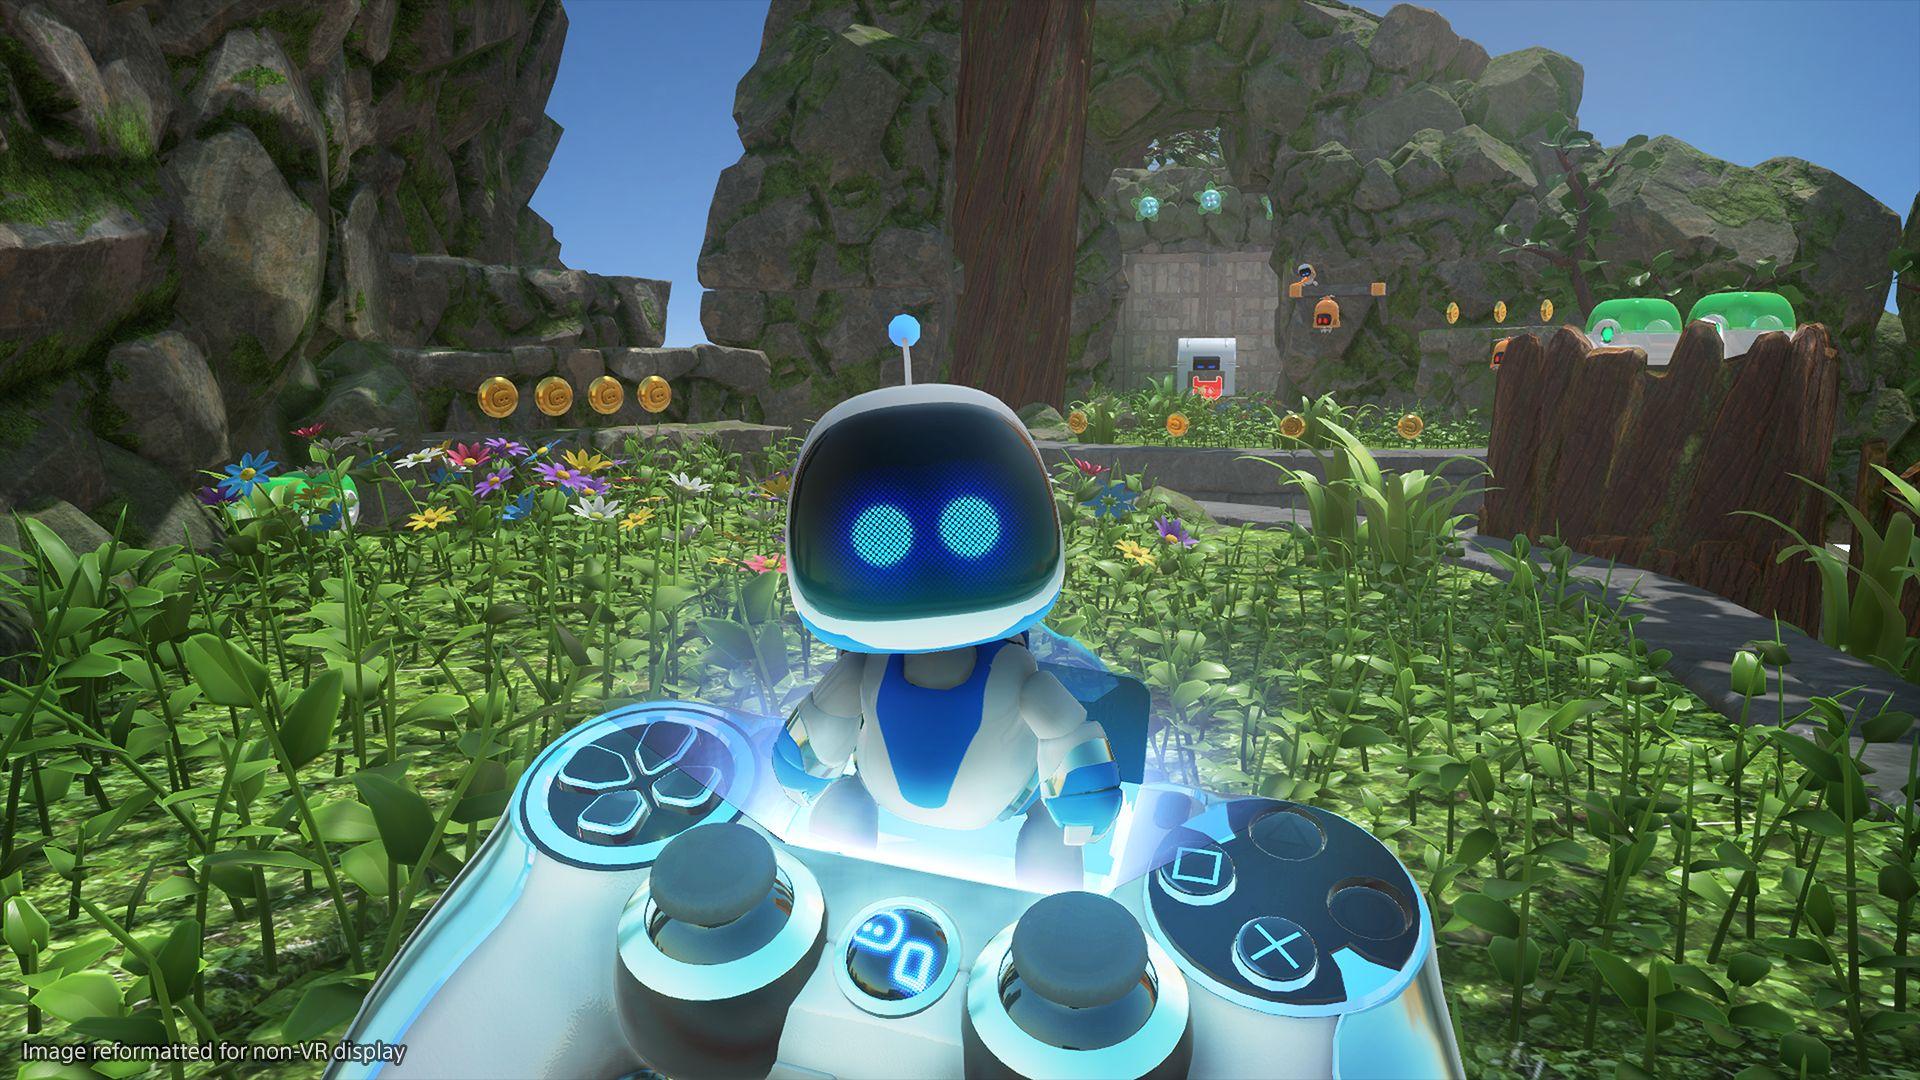 E3 2018   تصاویر جدیدی از بازی Astro Bot Rescue Mission منتشر شد